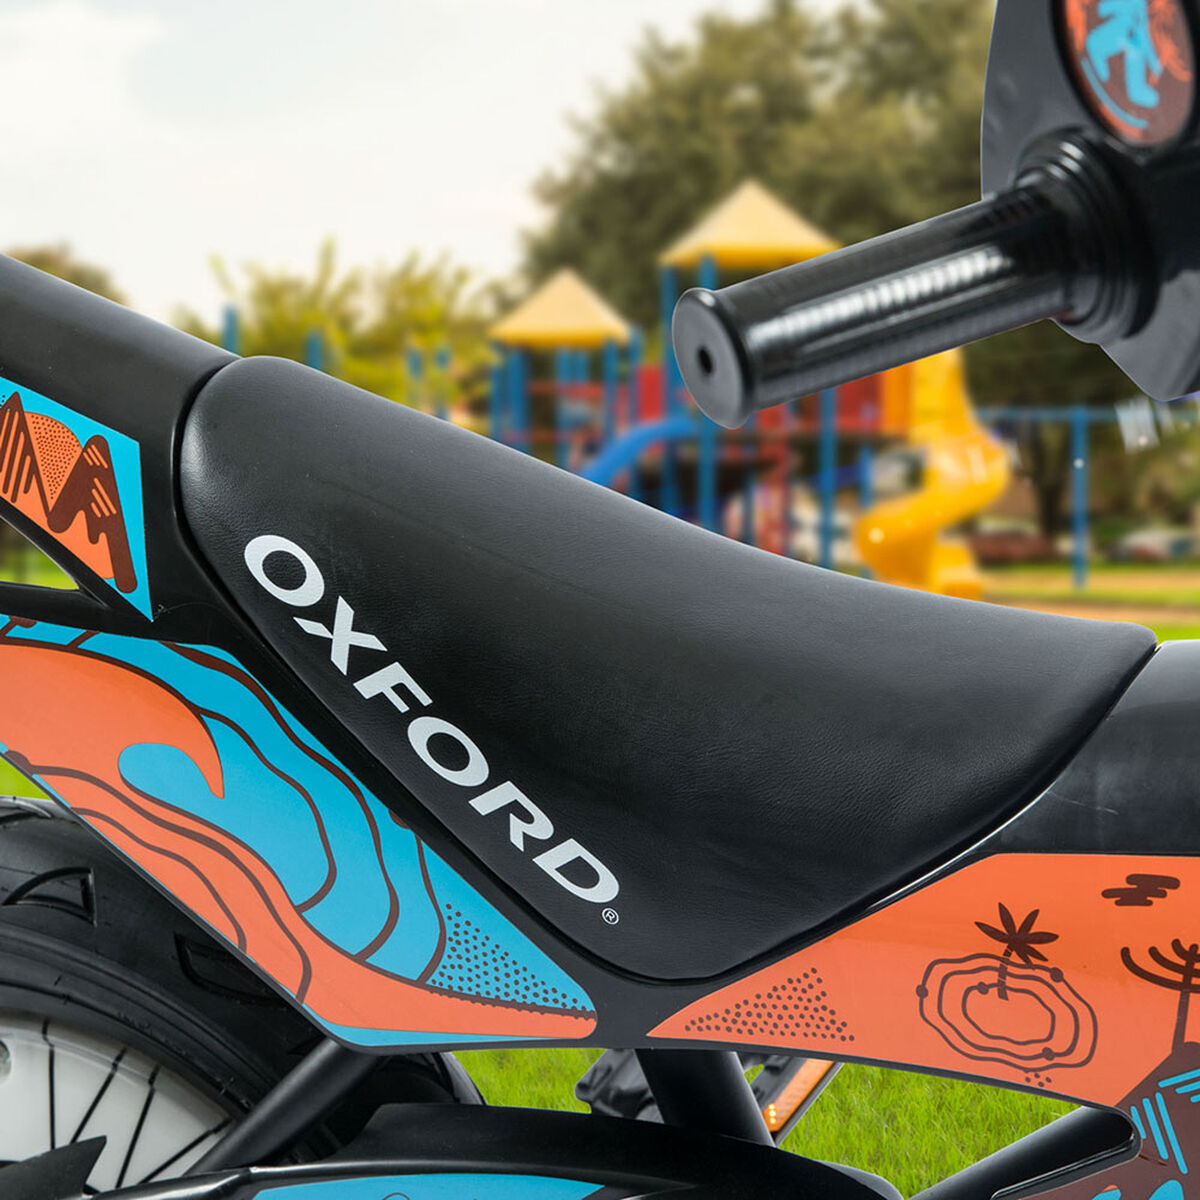 Bicicleta Infantil Niño Oxford Aro 12